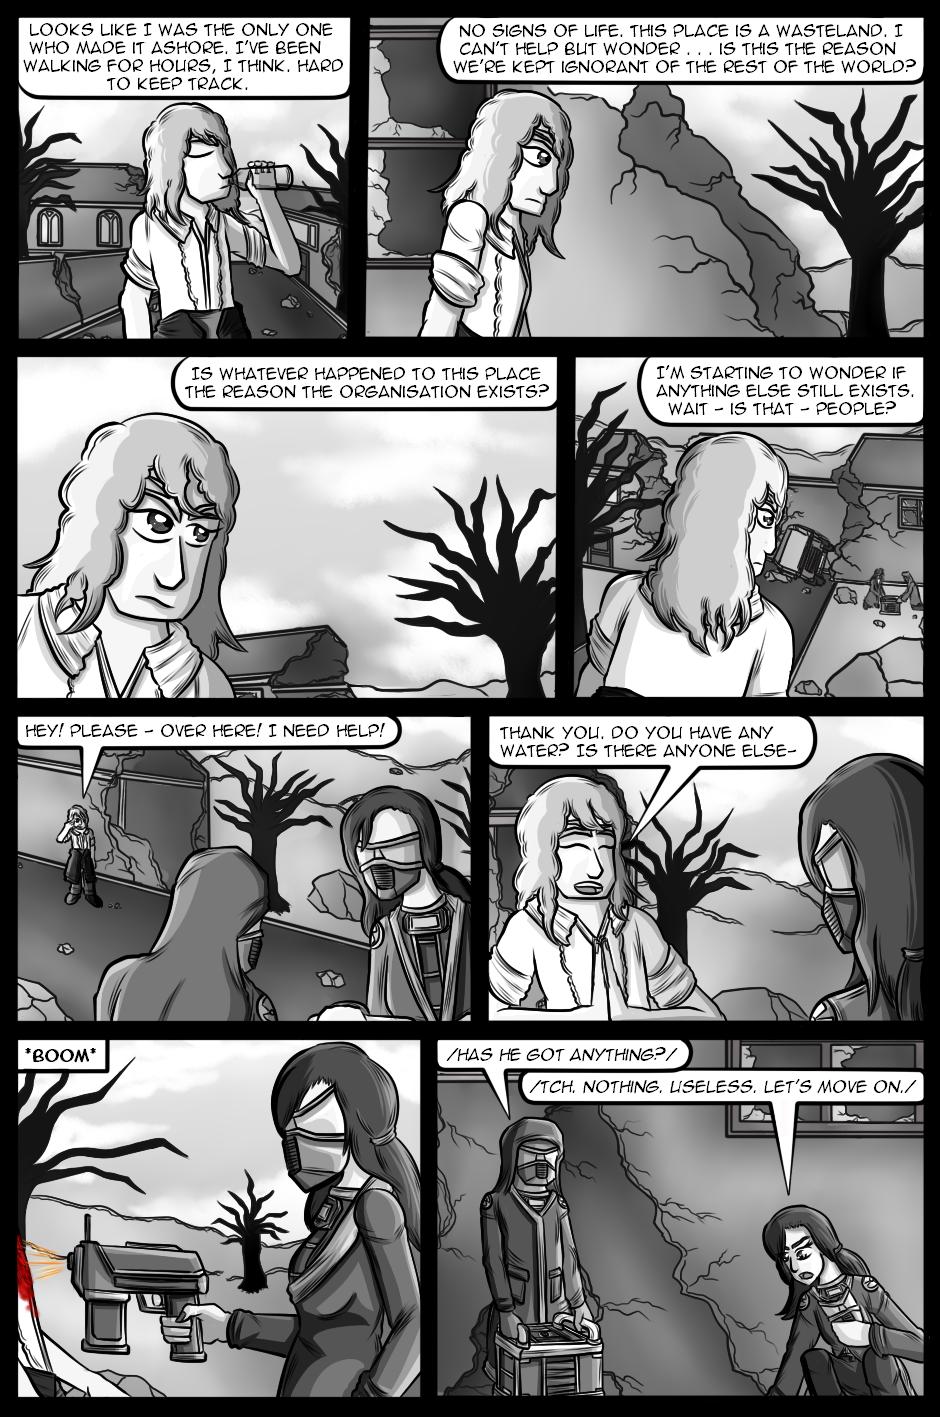 Fire Suppression, Part 56